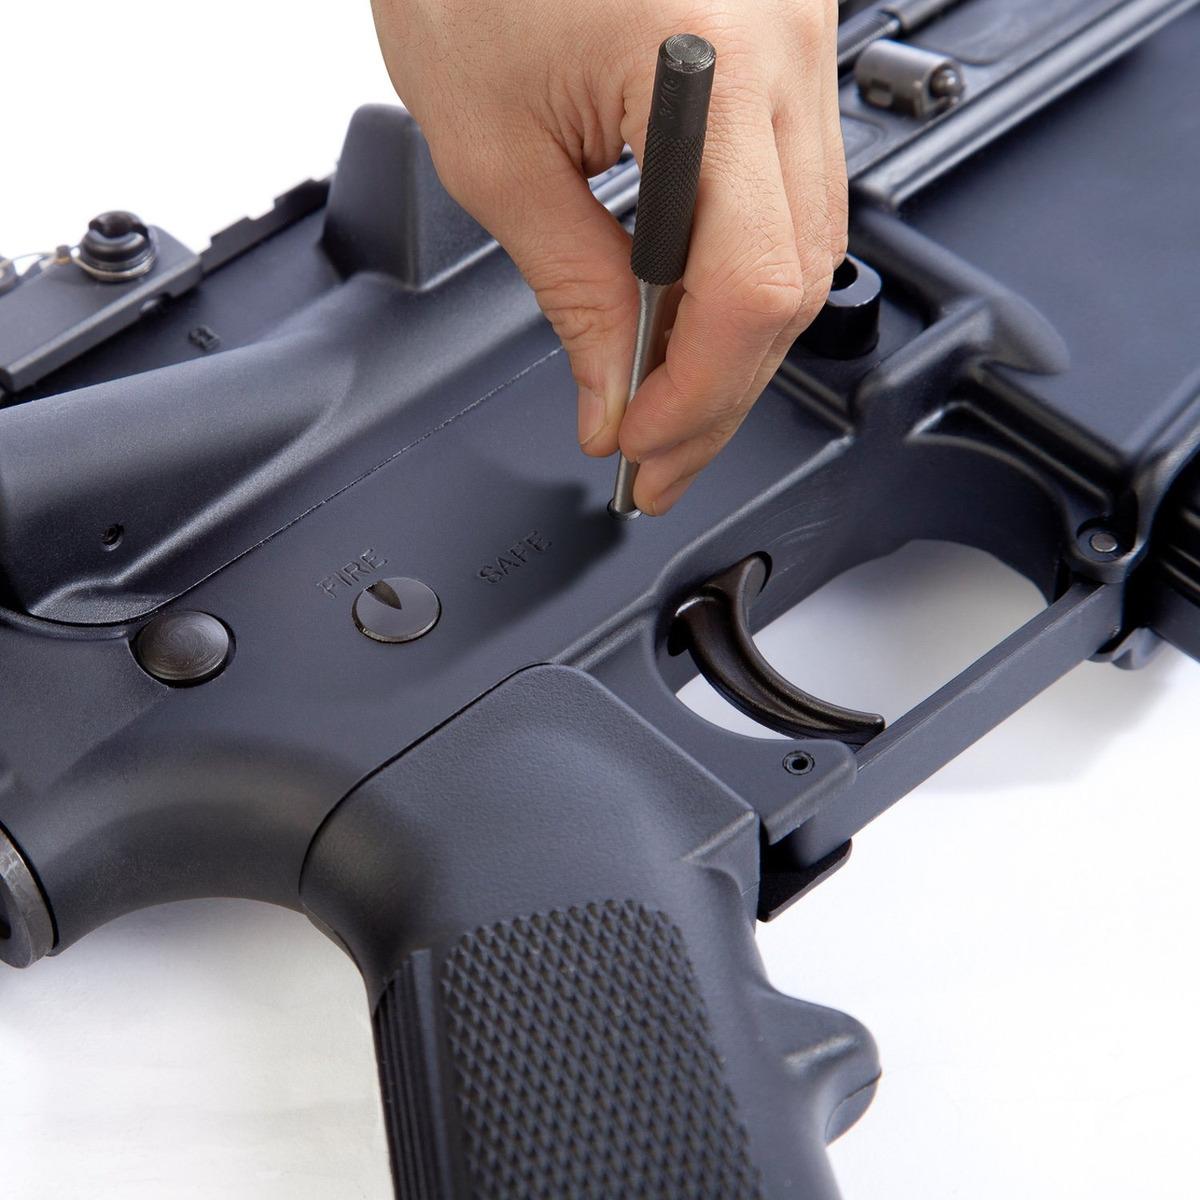 Industrial & Scientific Cutting Tools Improved Version Grip 9 pc ...